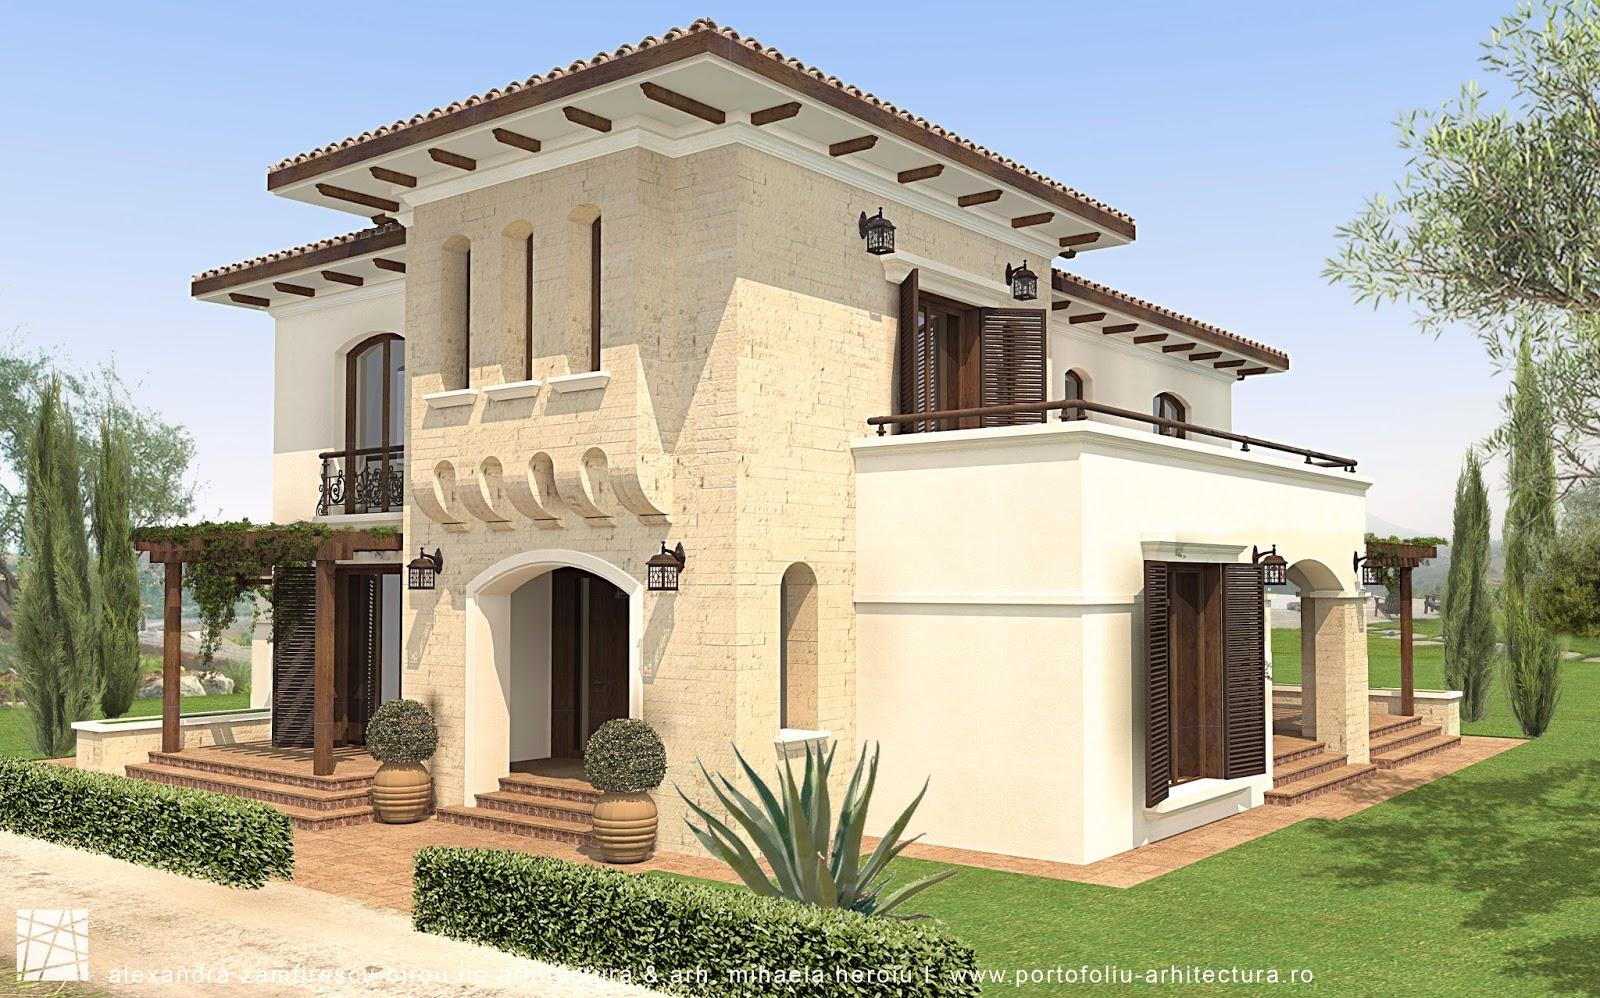 Casa mediteraneeana stil spaniol in constanta for Arhitectura case cu mansarda